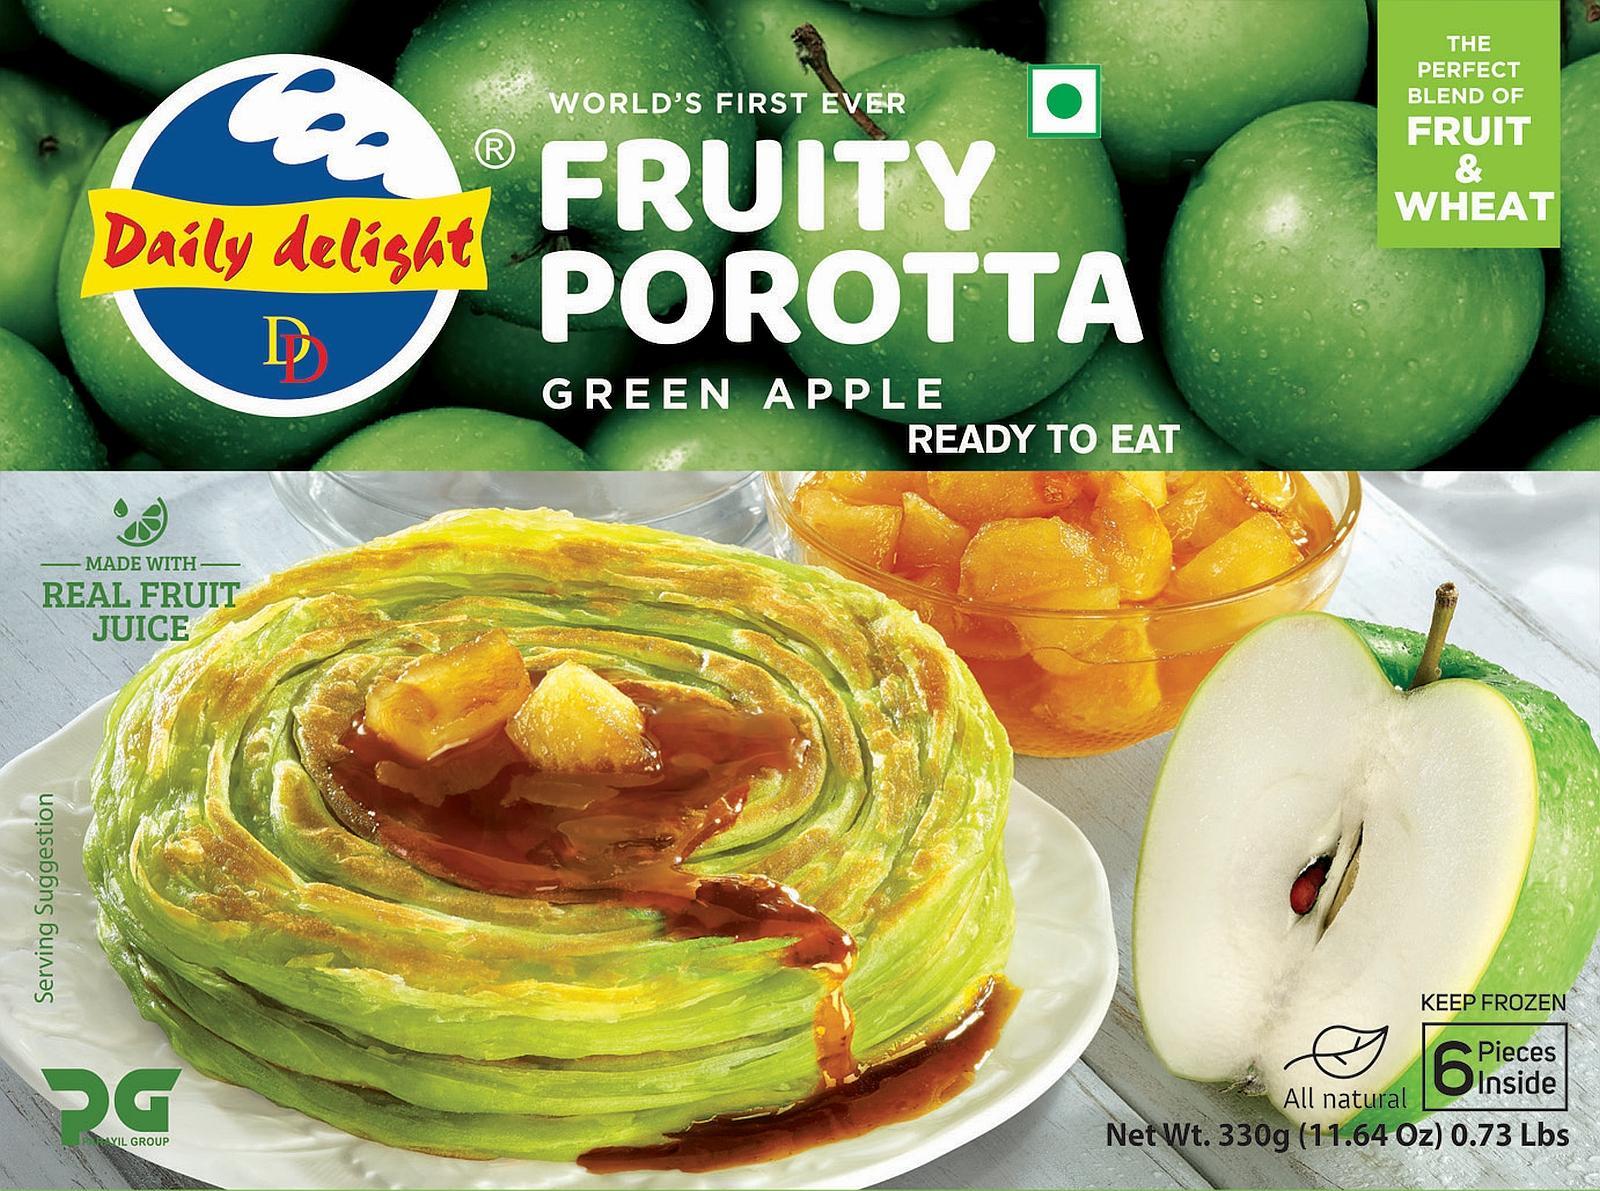 Daily Delight Green Apple Porotta